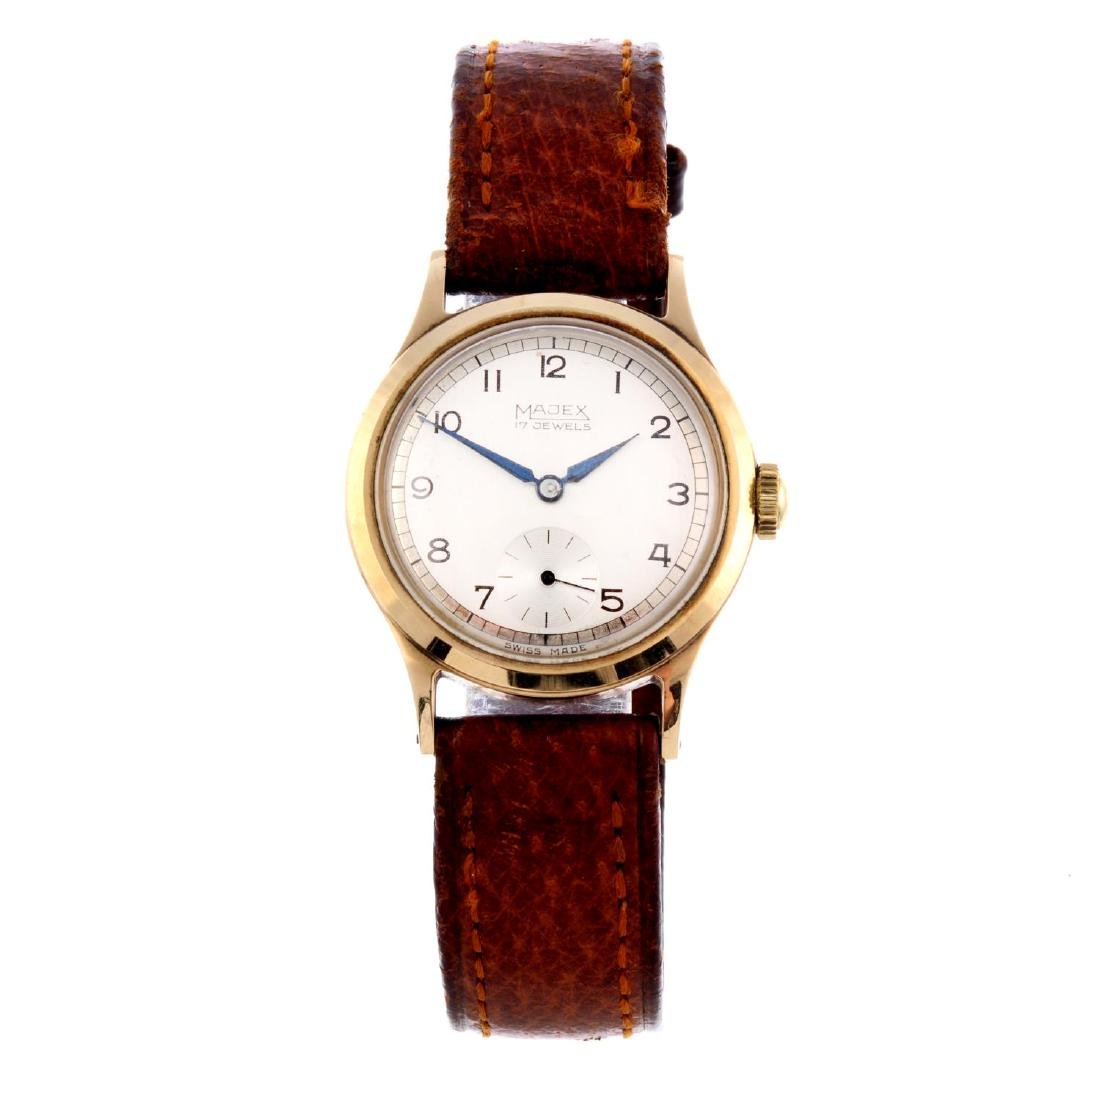 MAJEX - a mid-size wrist watch. 9ct yellow gold case,